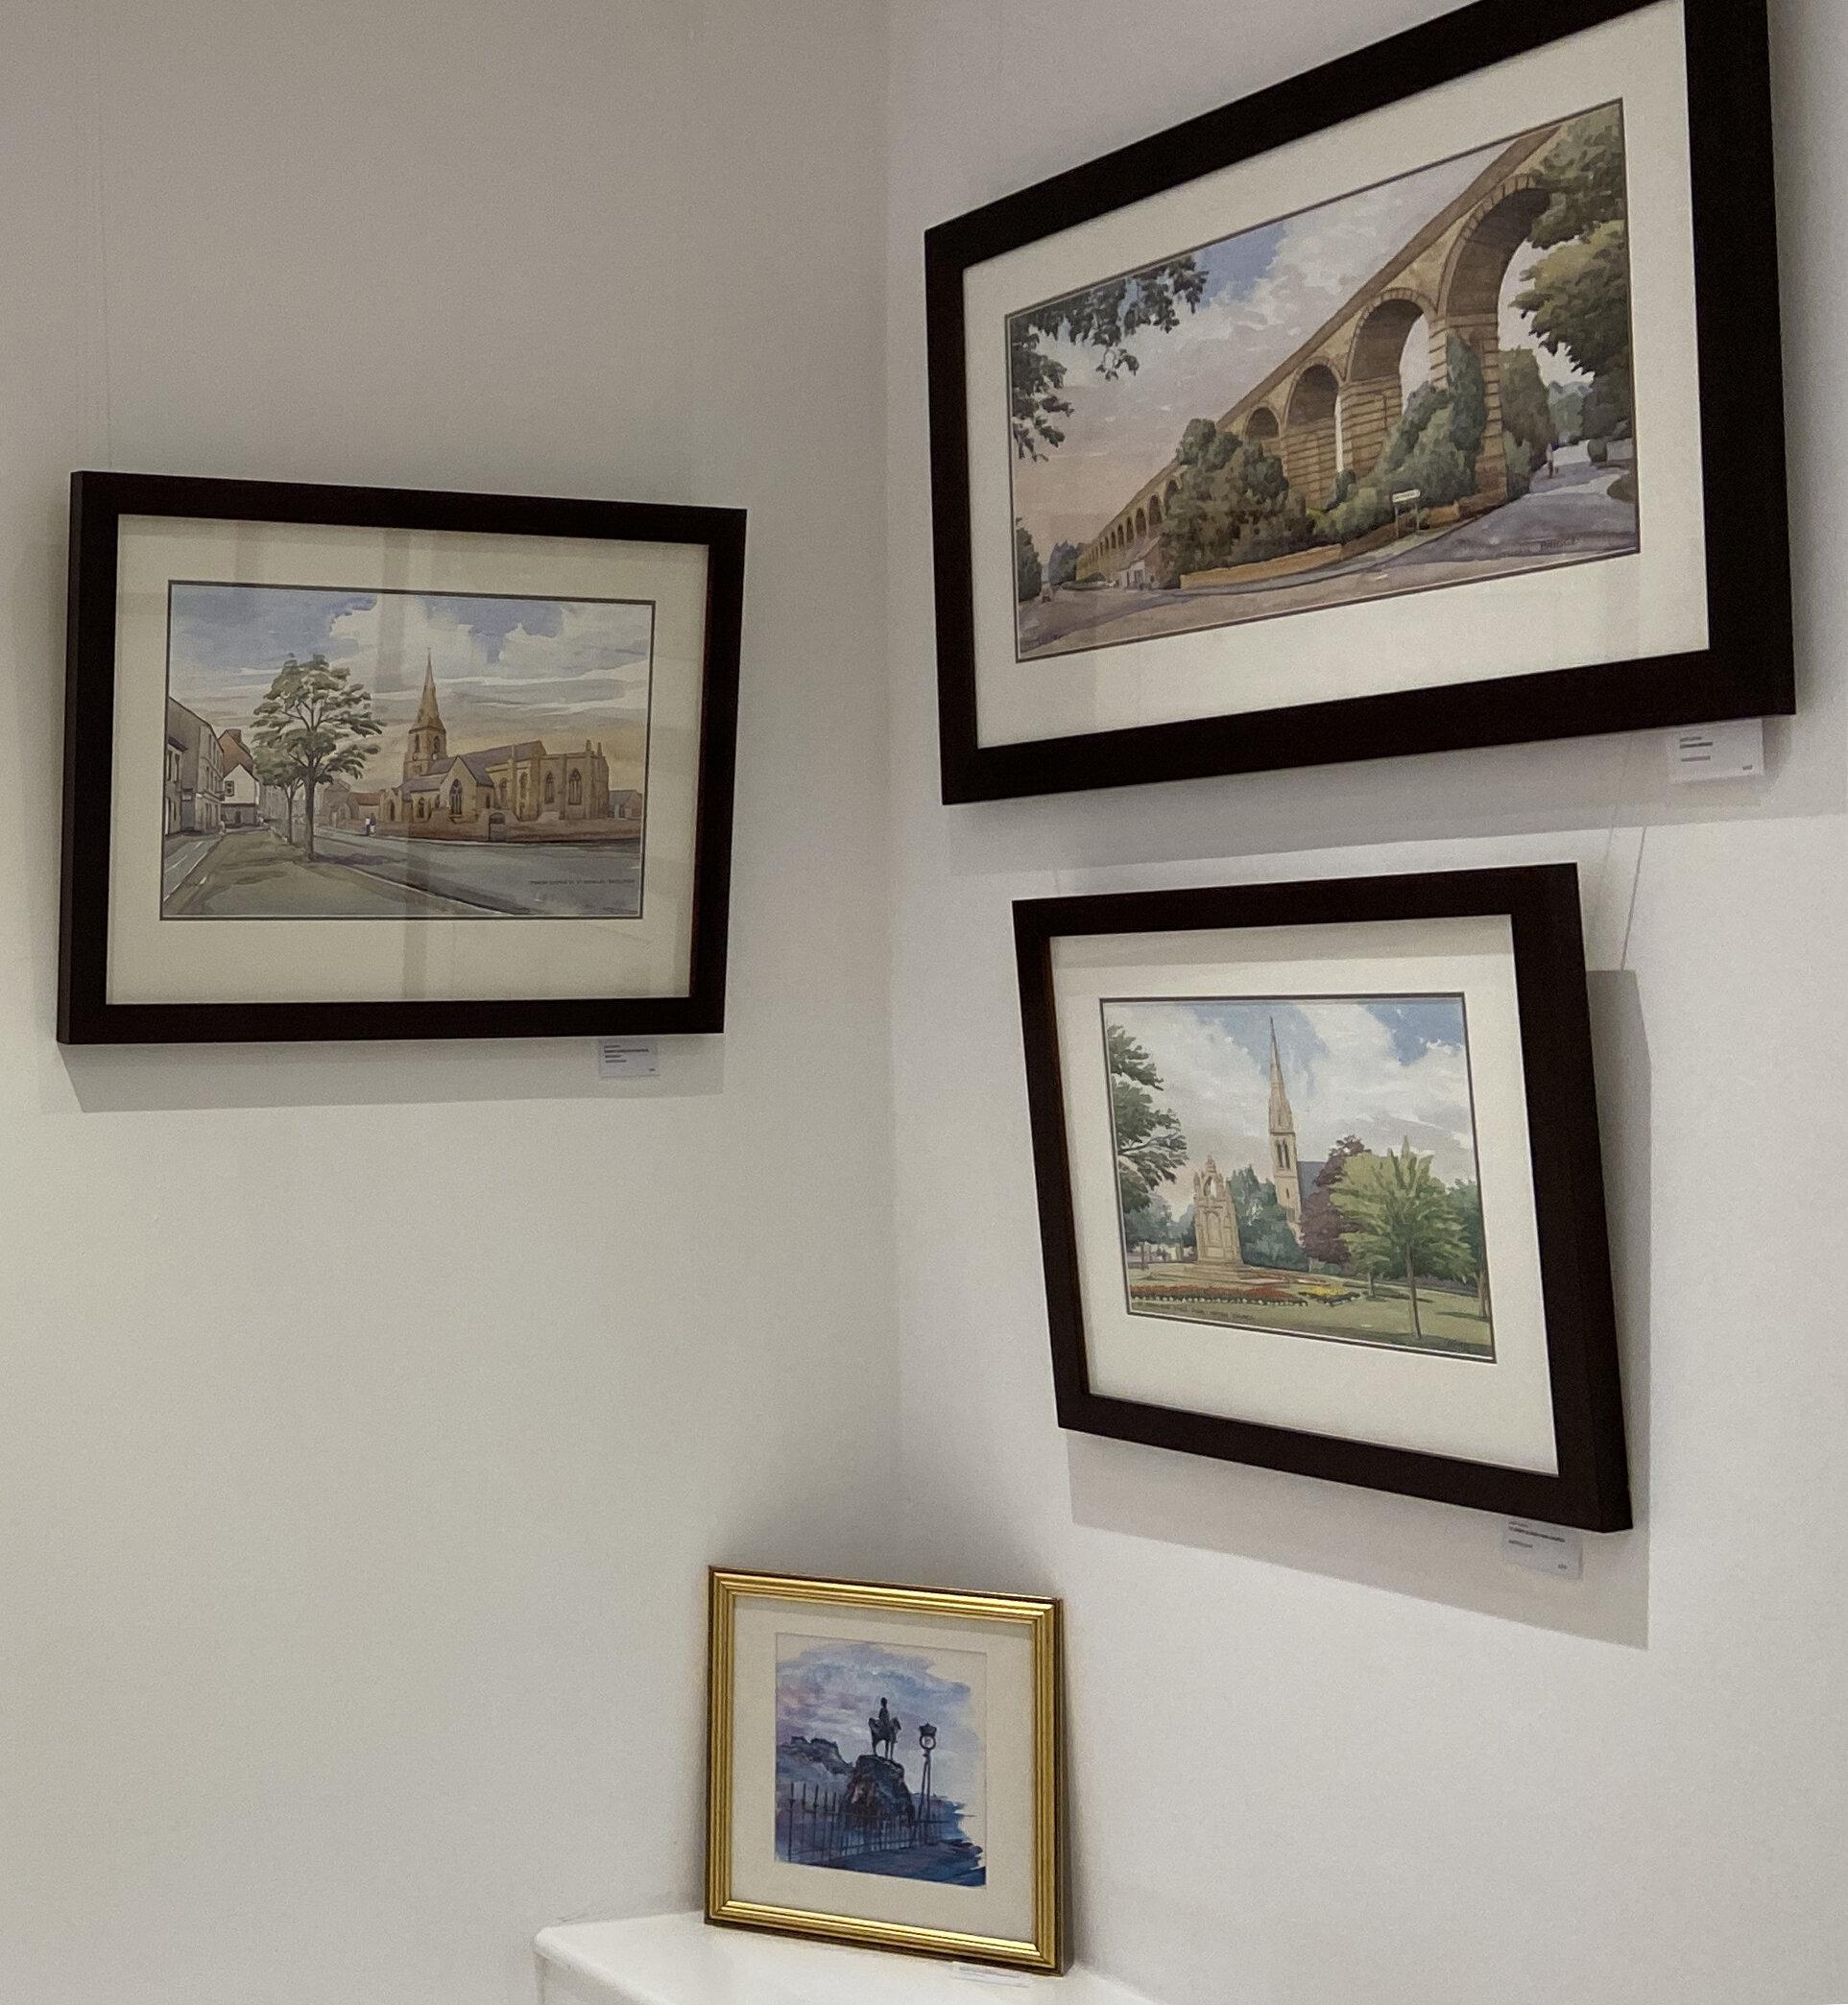 Jeff Lockey - prints of original watercolours, various frames